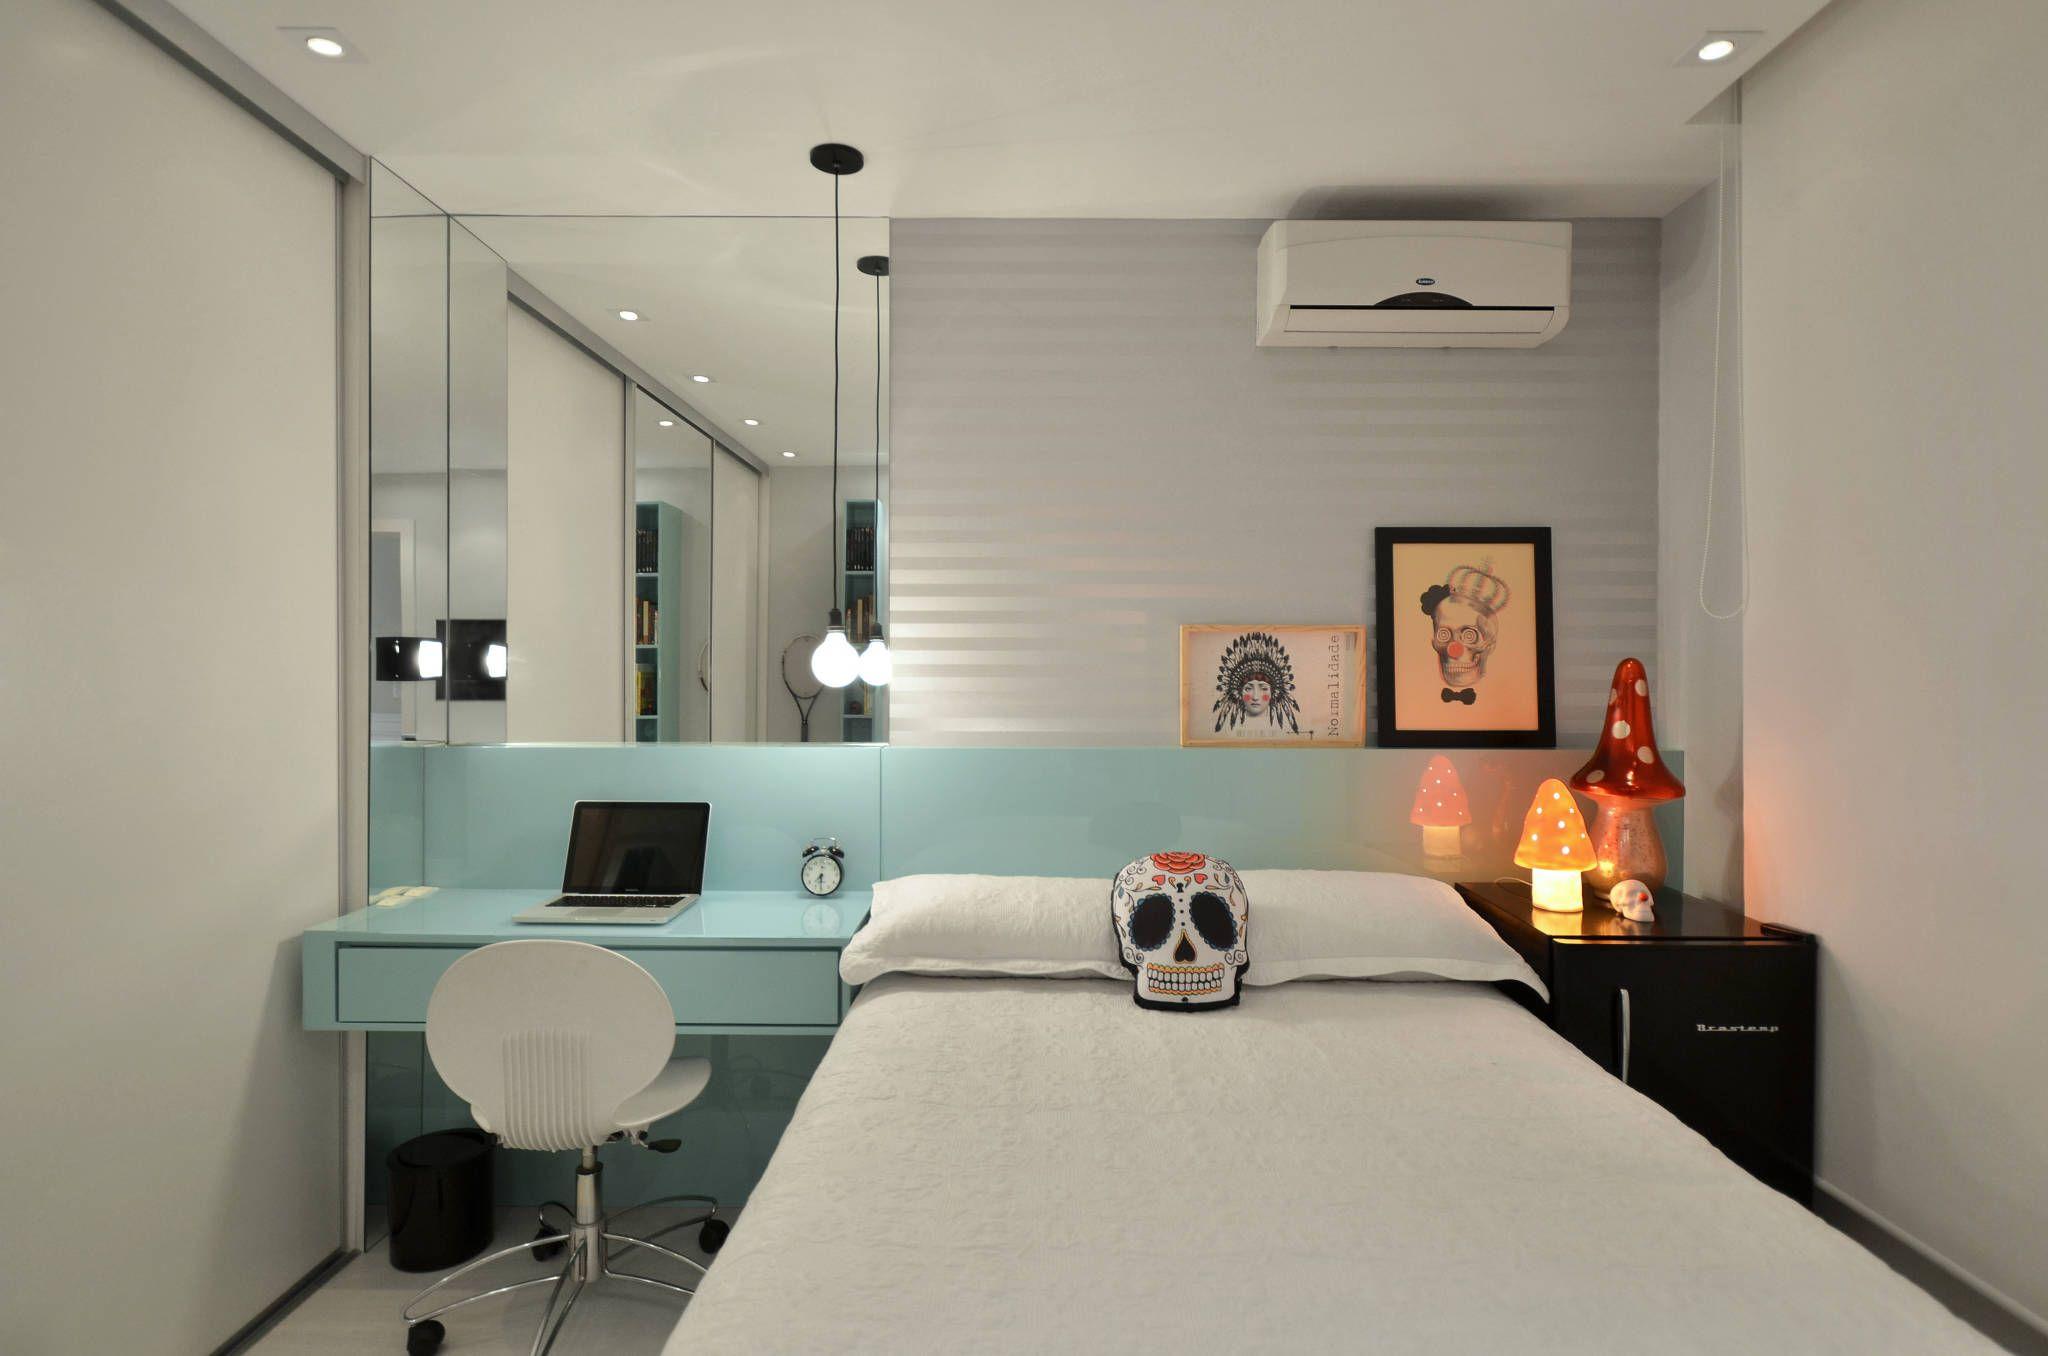 Dormit rios adolescentes quartos por johnny thomsen for Dormitorios super modernos